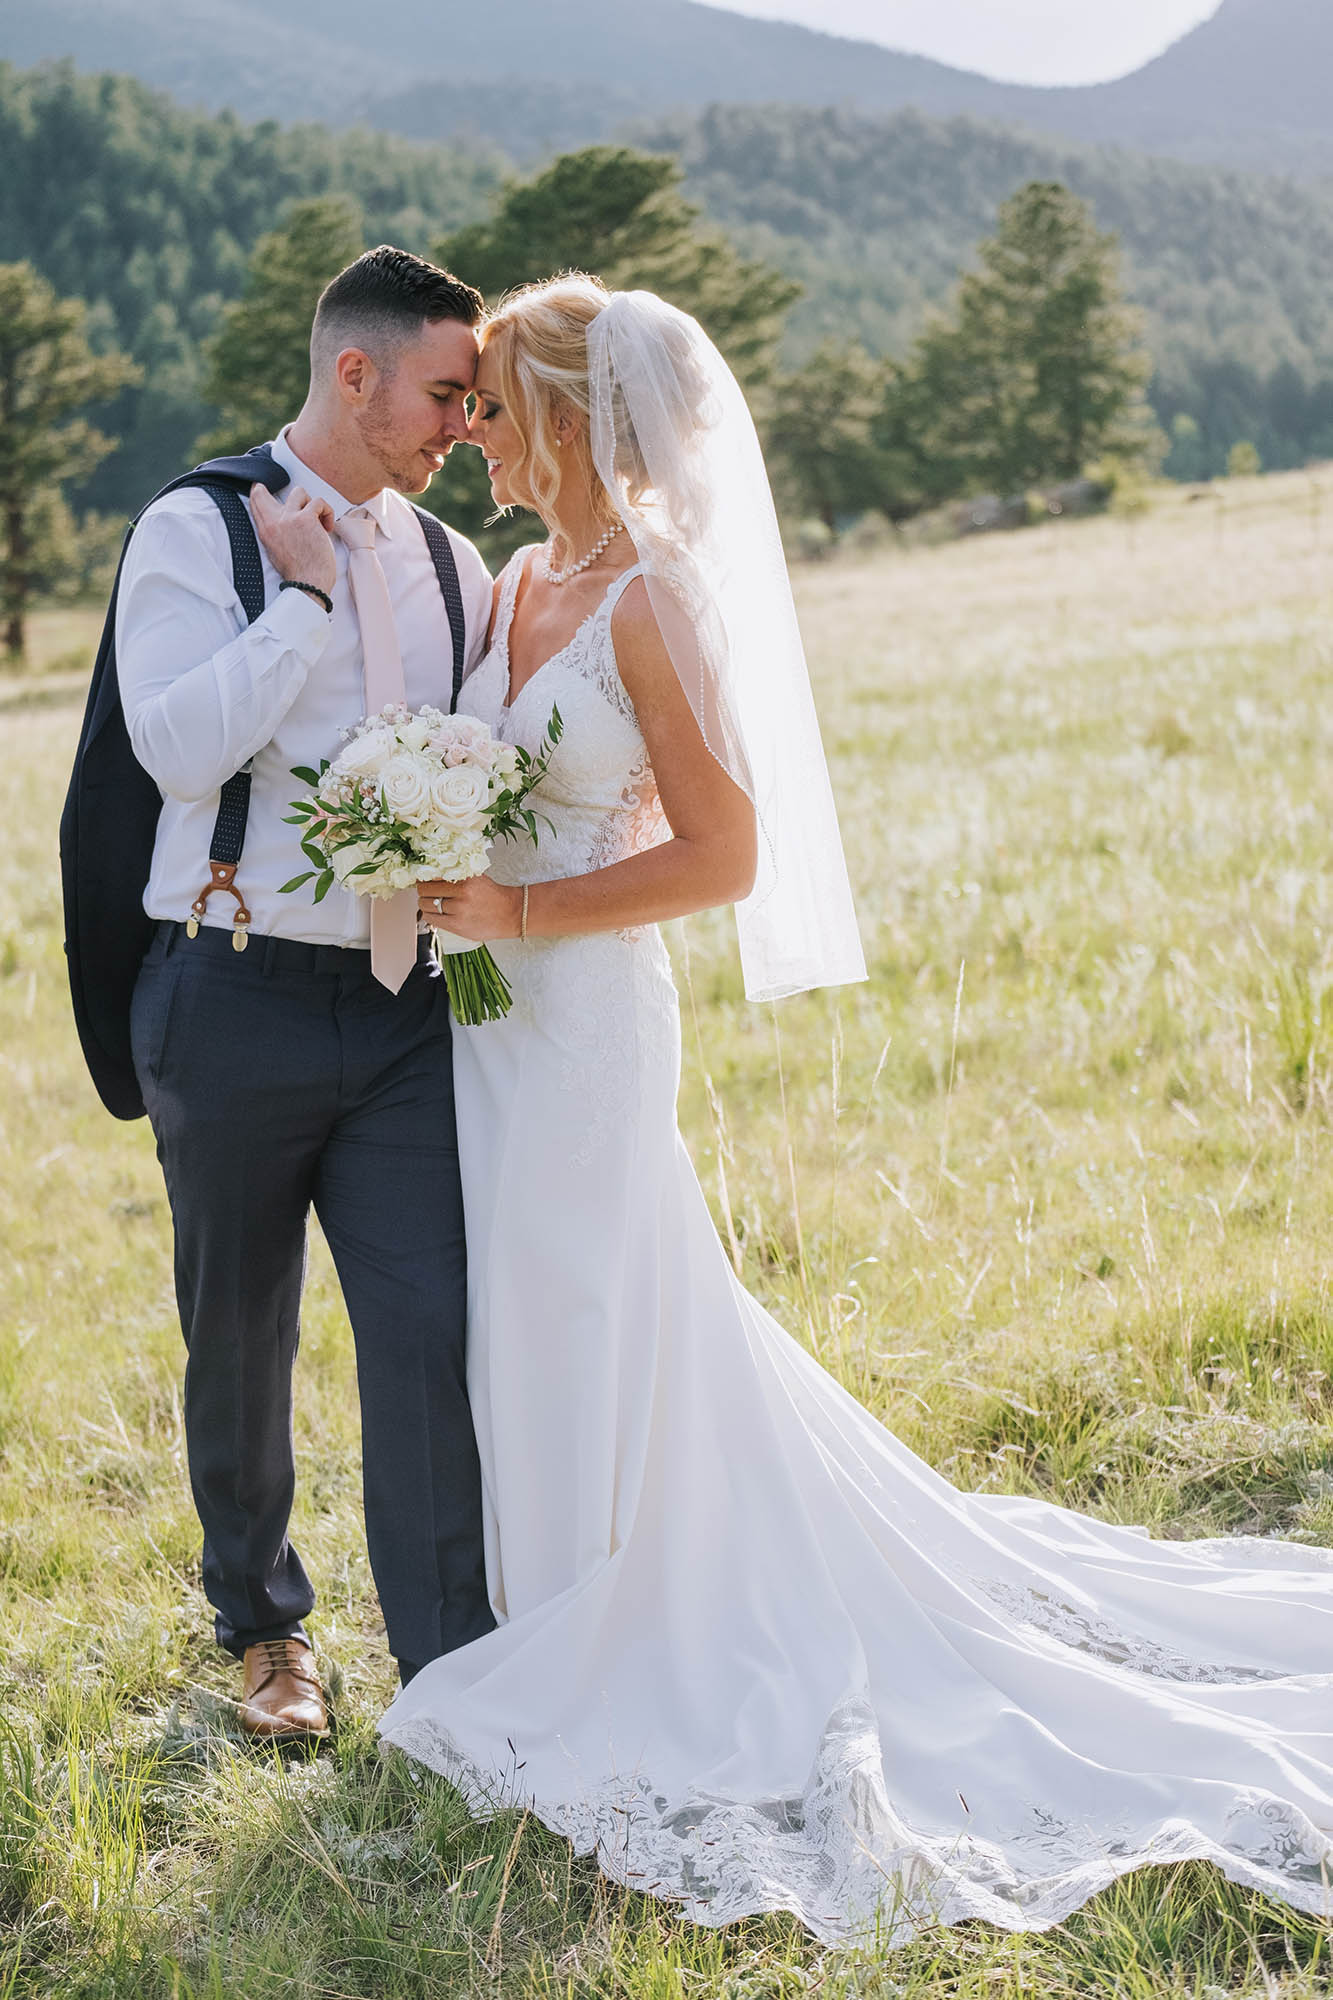 wedding day poses